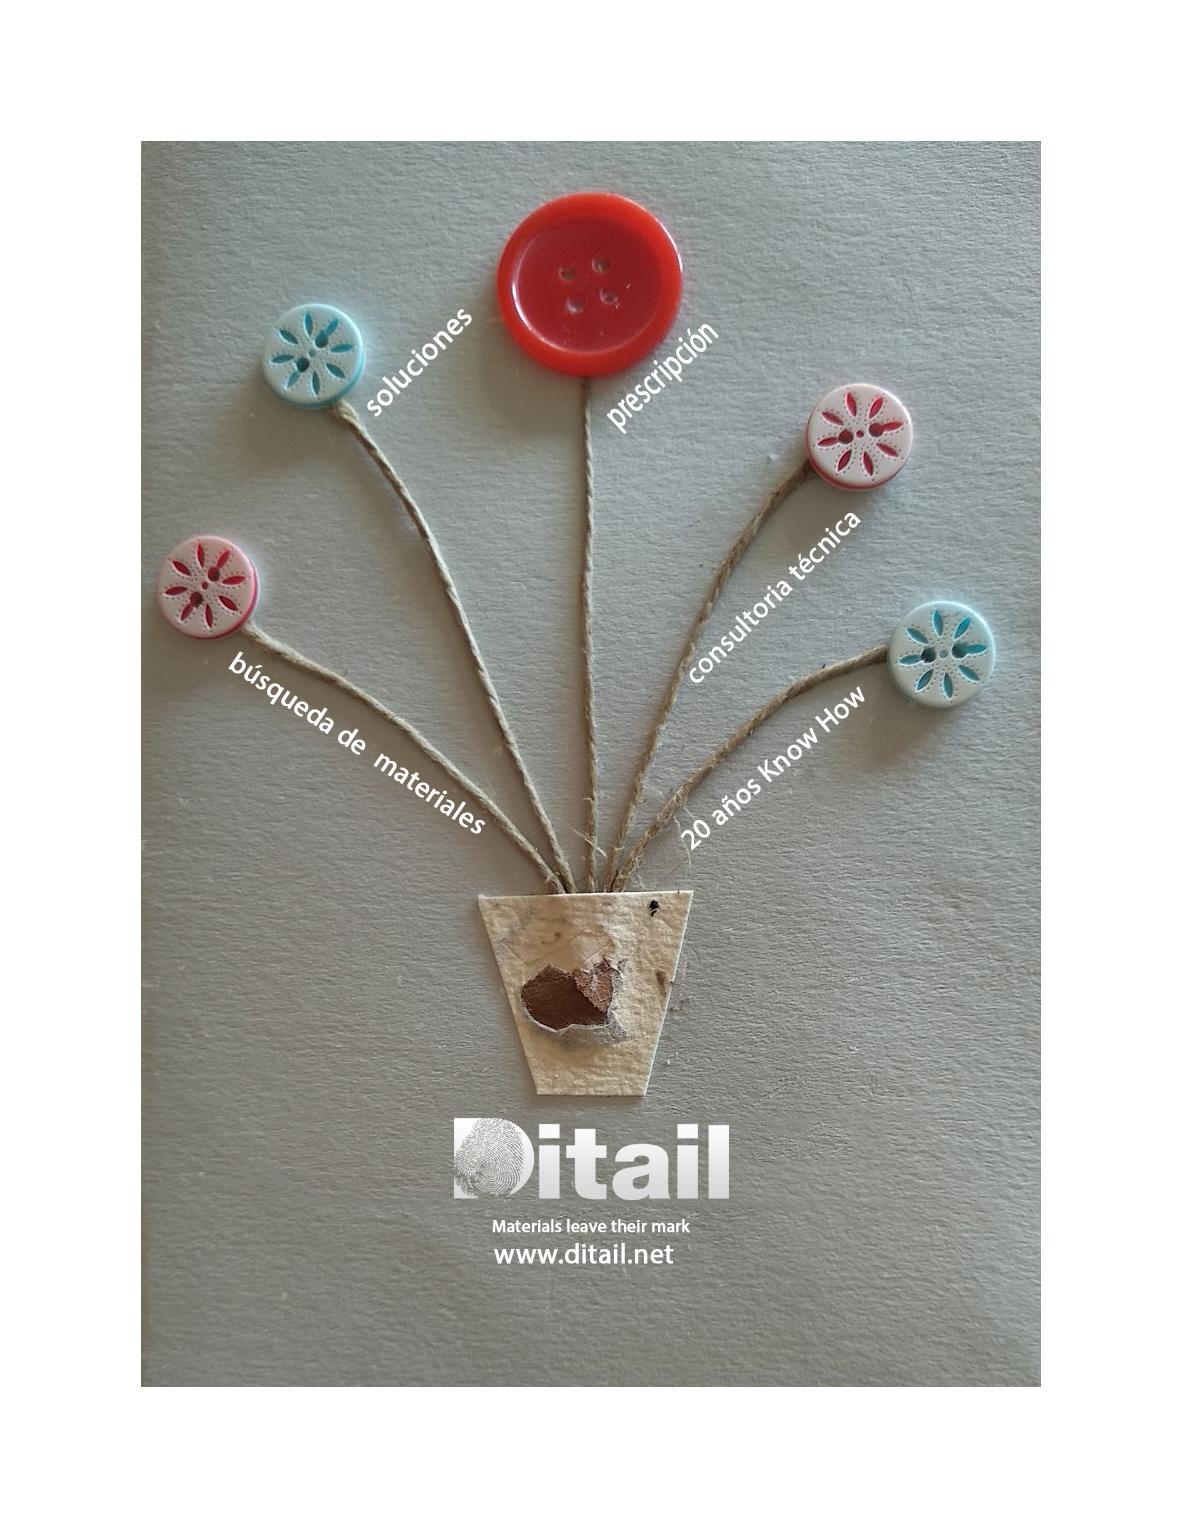 ditail-soluciones-prescripcion-ceramica